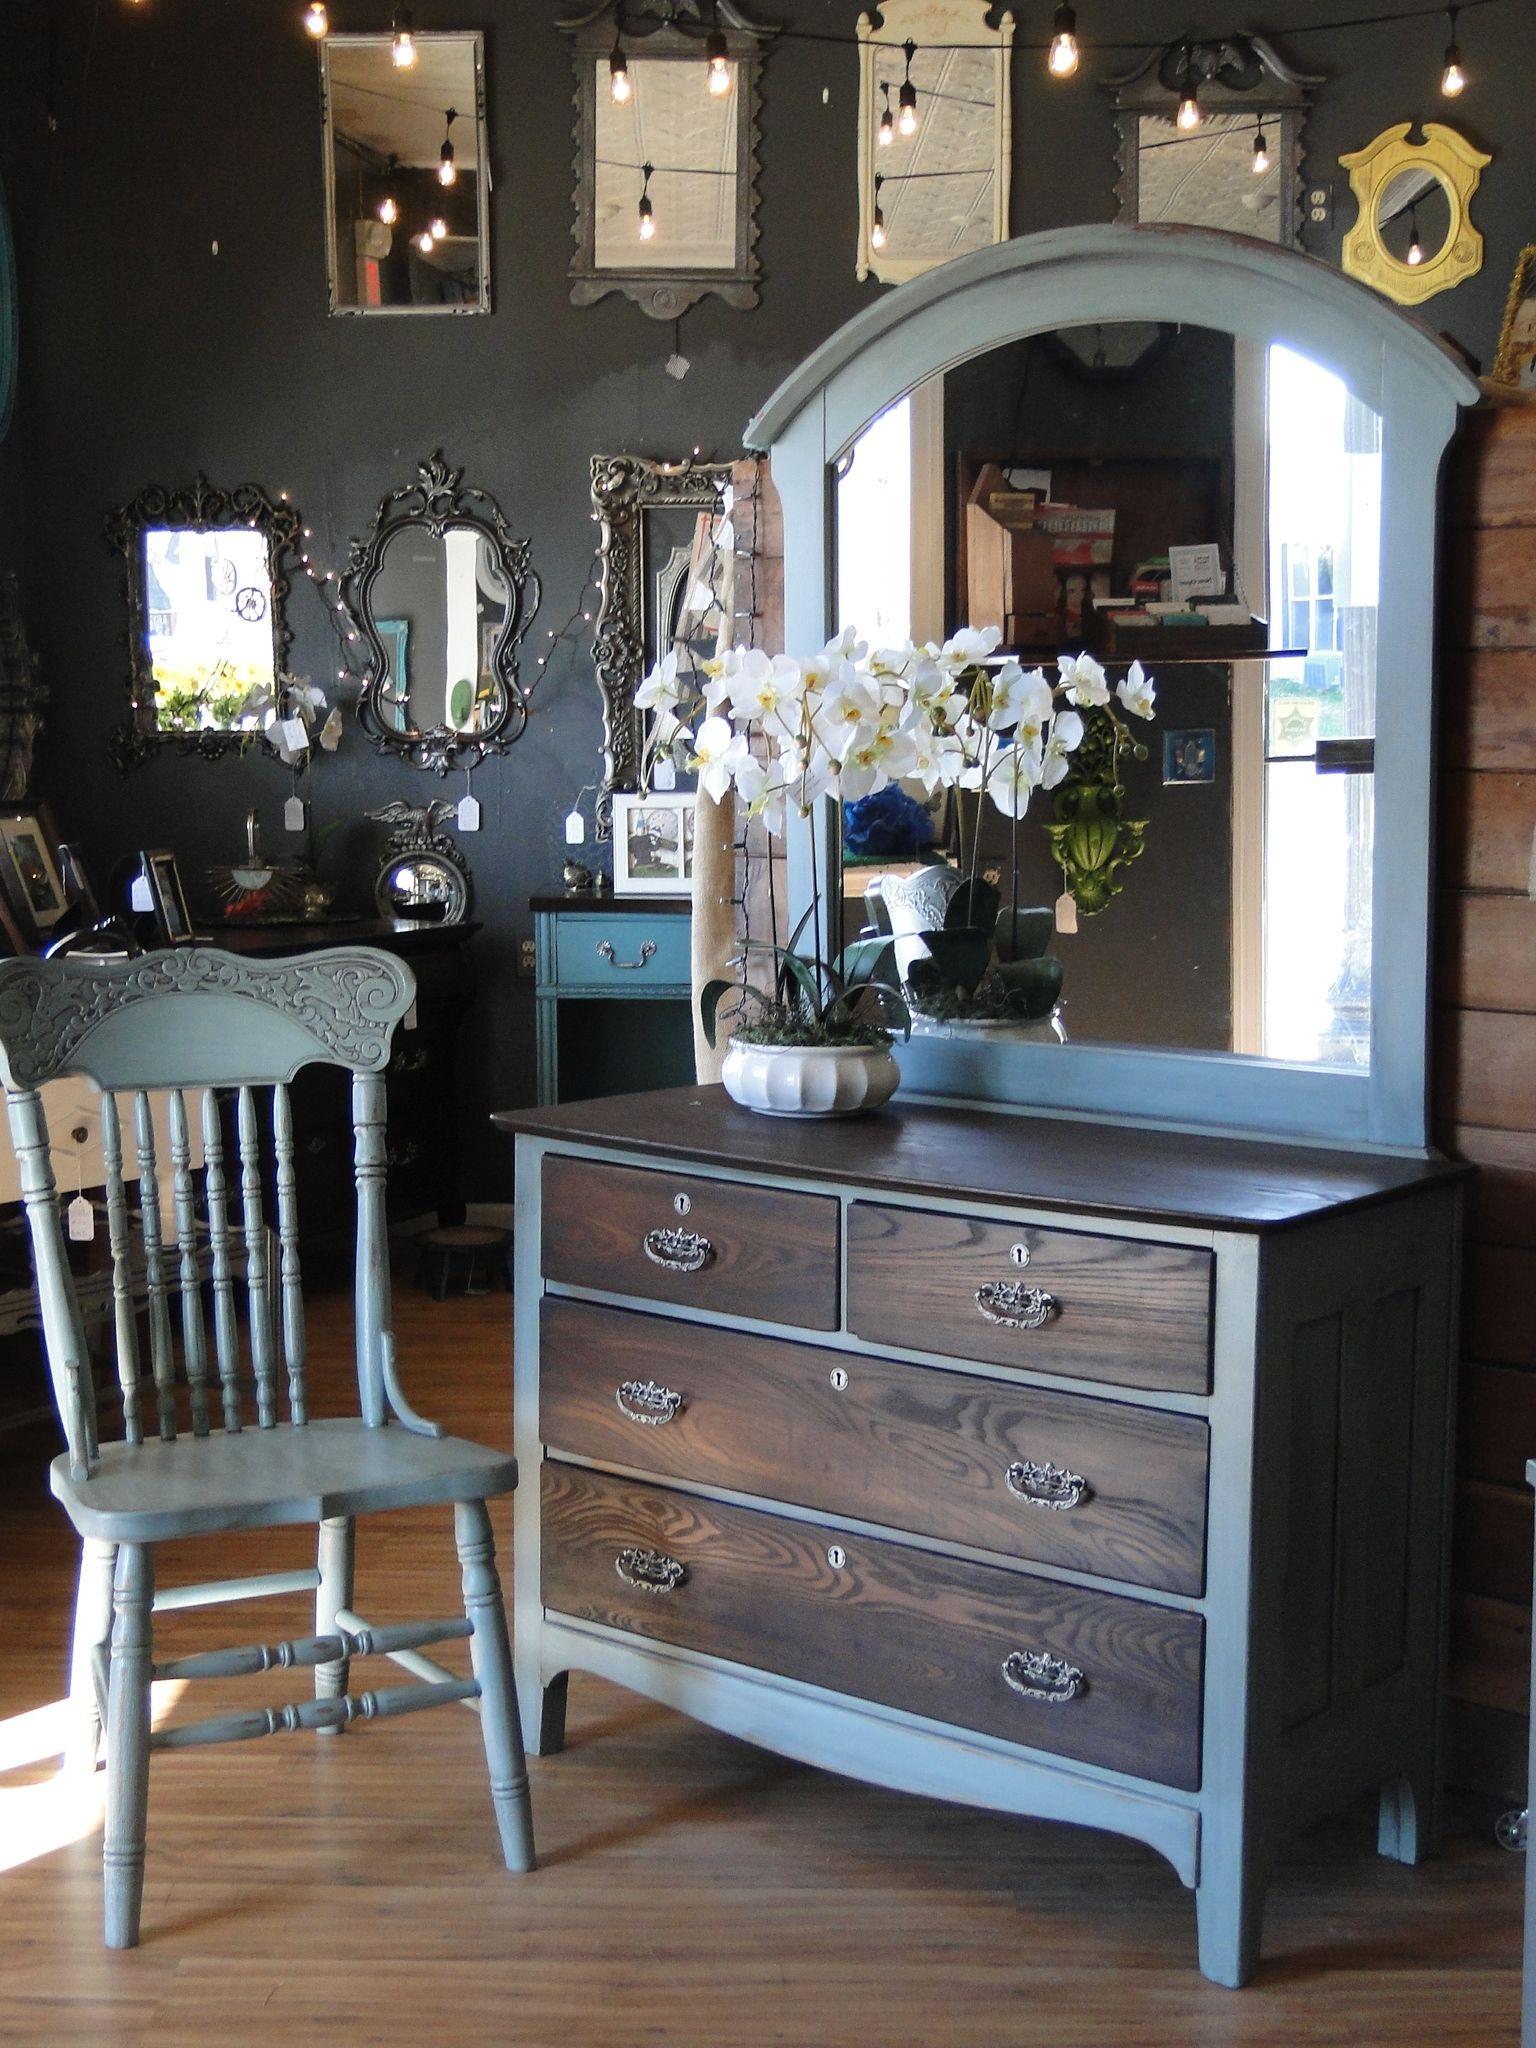 The best images about dressers on pinterest oak dresser